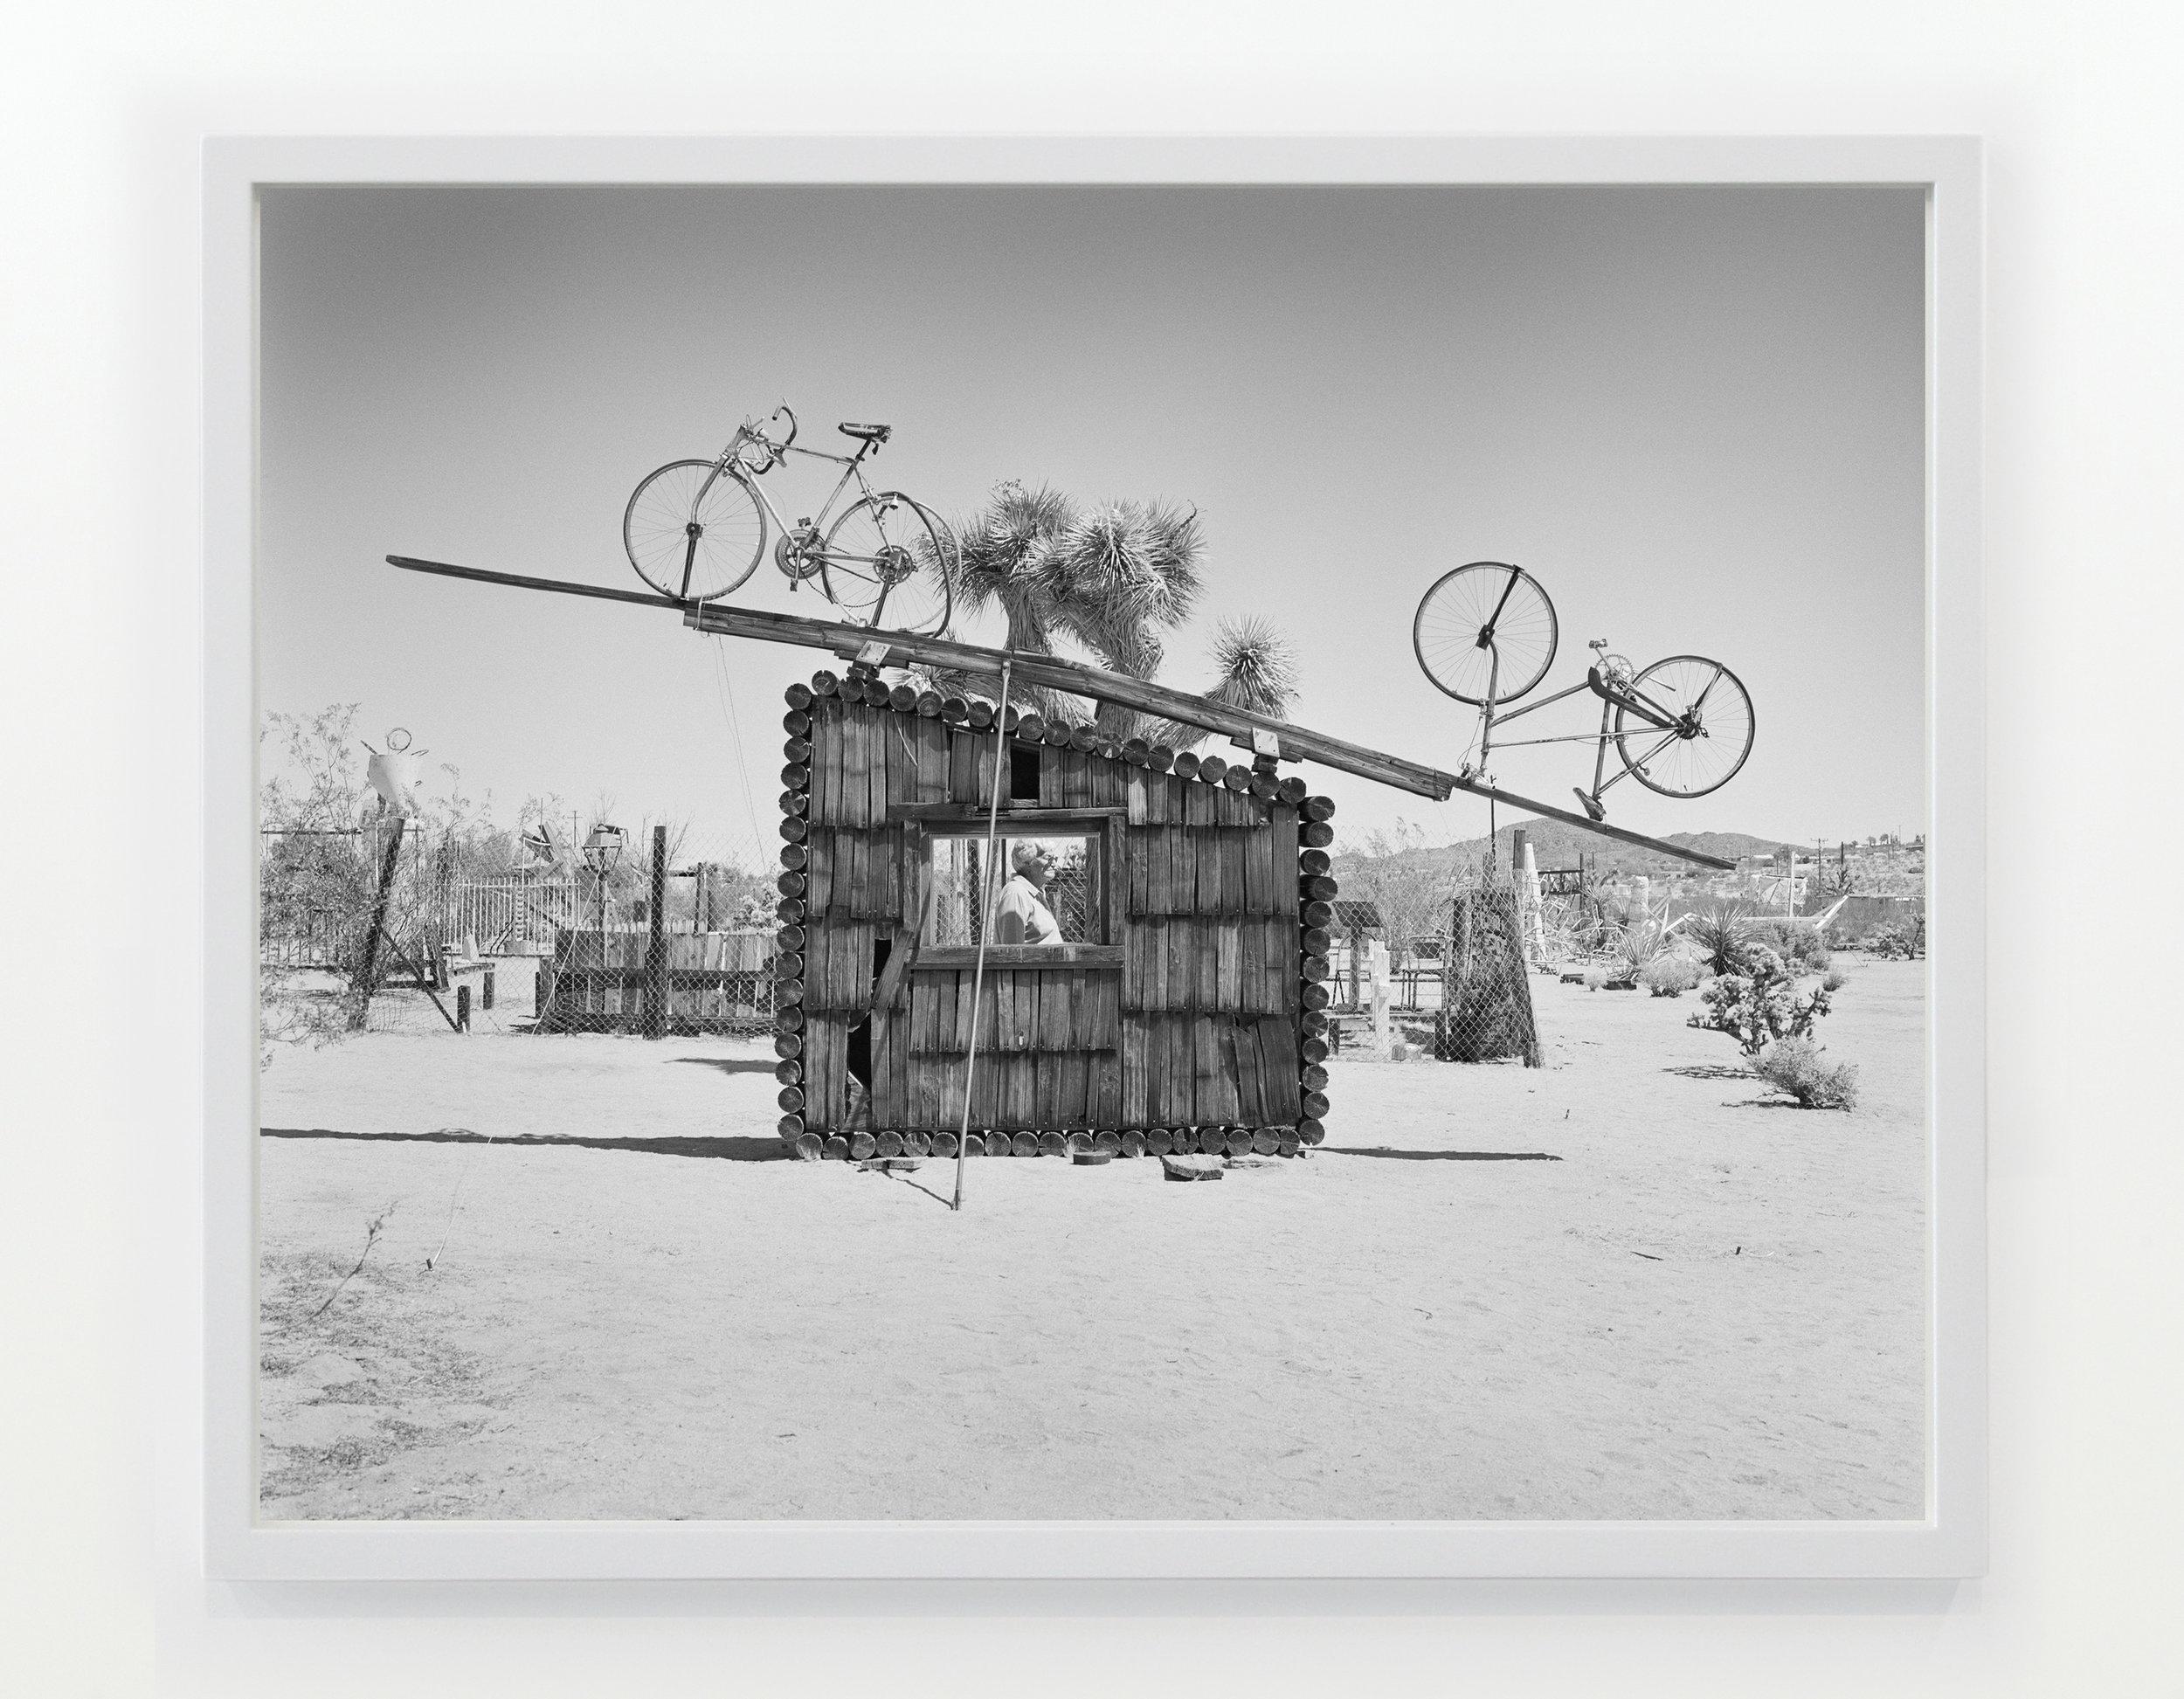 Pat Brunty the caretaker standing behind No Contest 1994, Noah Purifoy Outdoor Desert Art Museum, Joshua Tree, CA 2016/2017 © Latoya Ruby Frazier